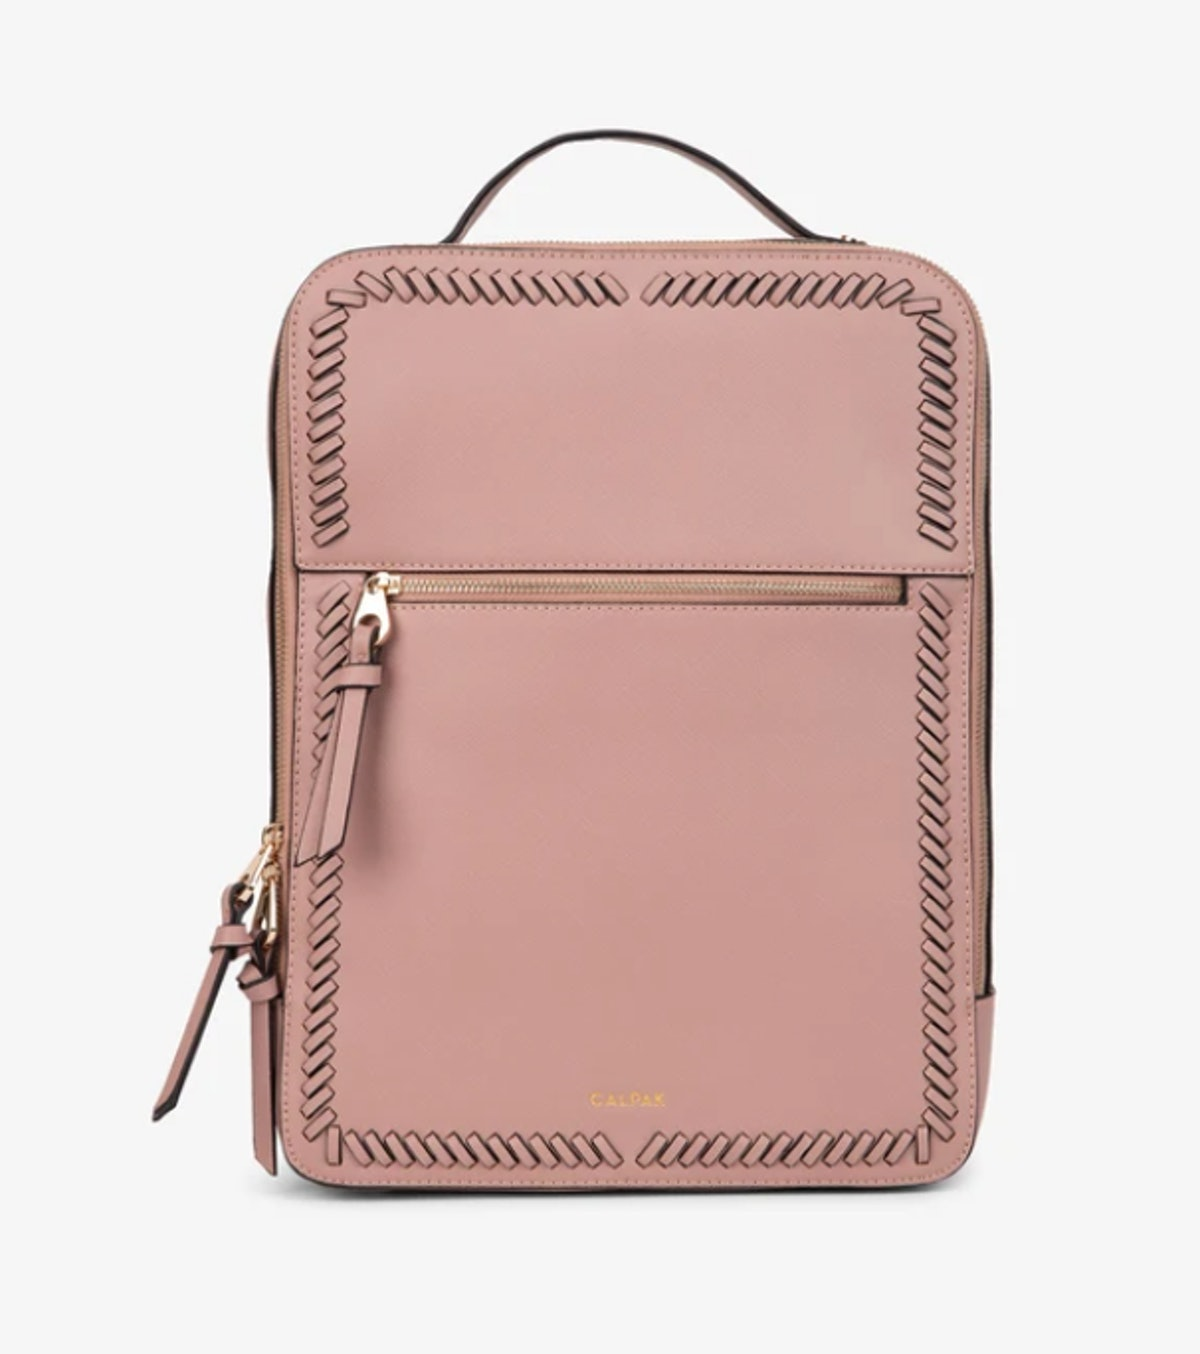 Calpak laptop bag in mauve with detailed trims.